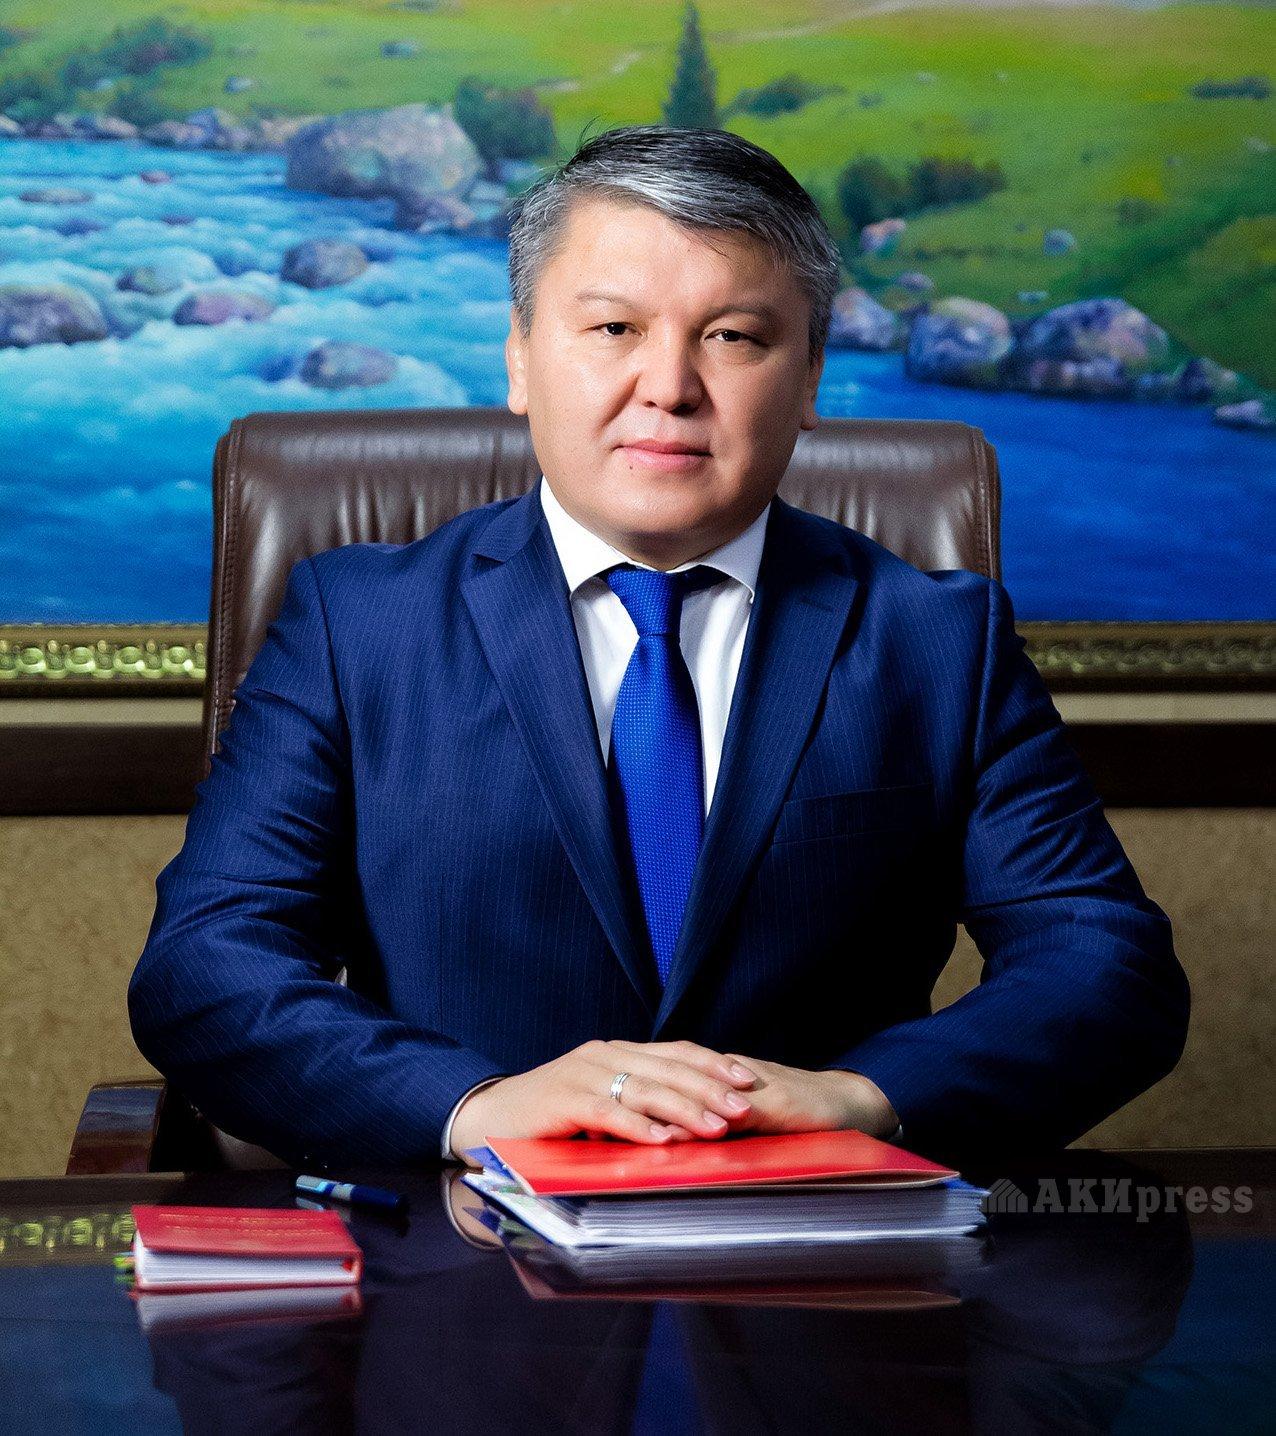 фото премьер-министр узбекистана